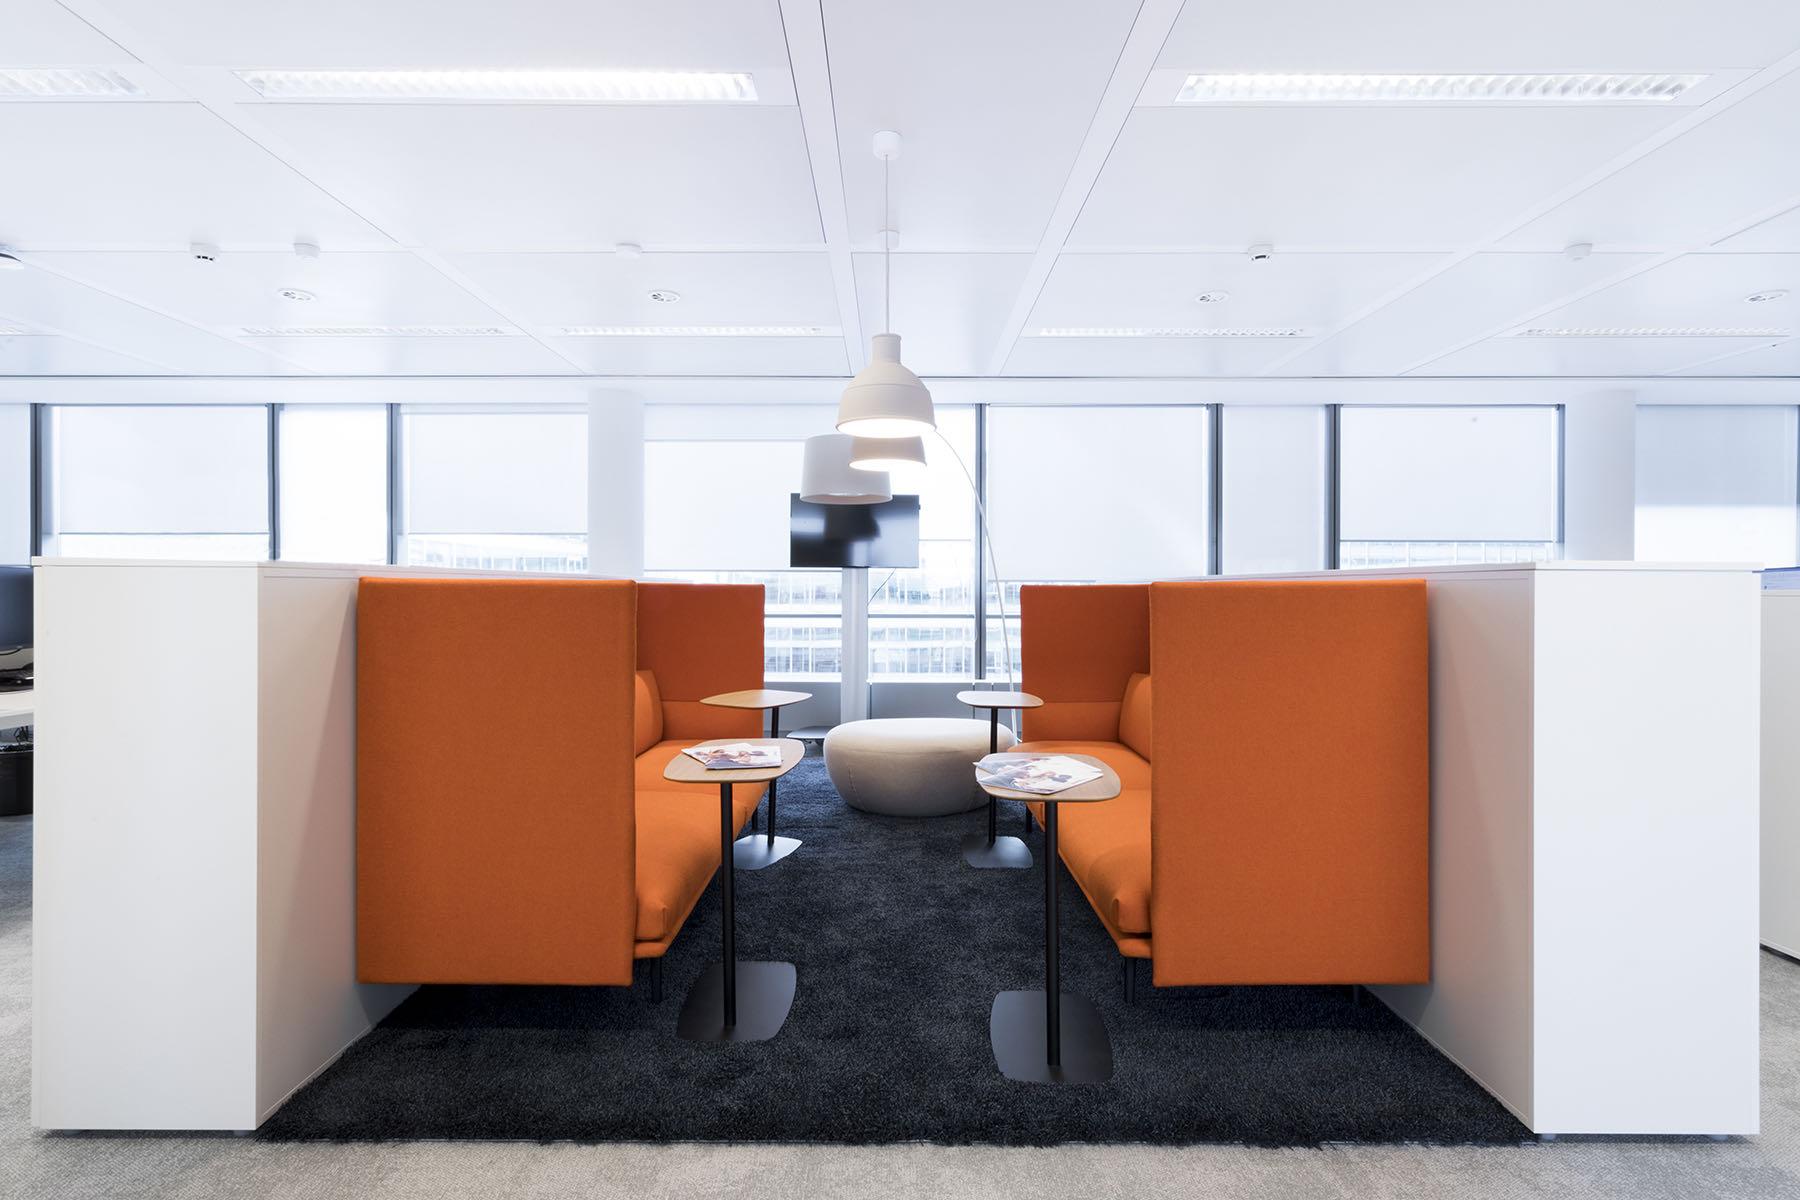 cefora-brussels-office-4